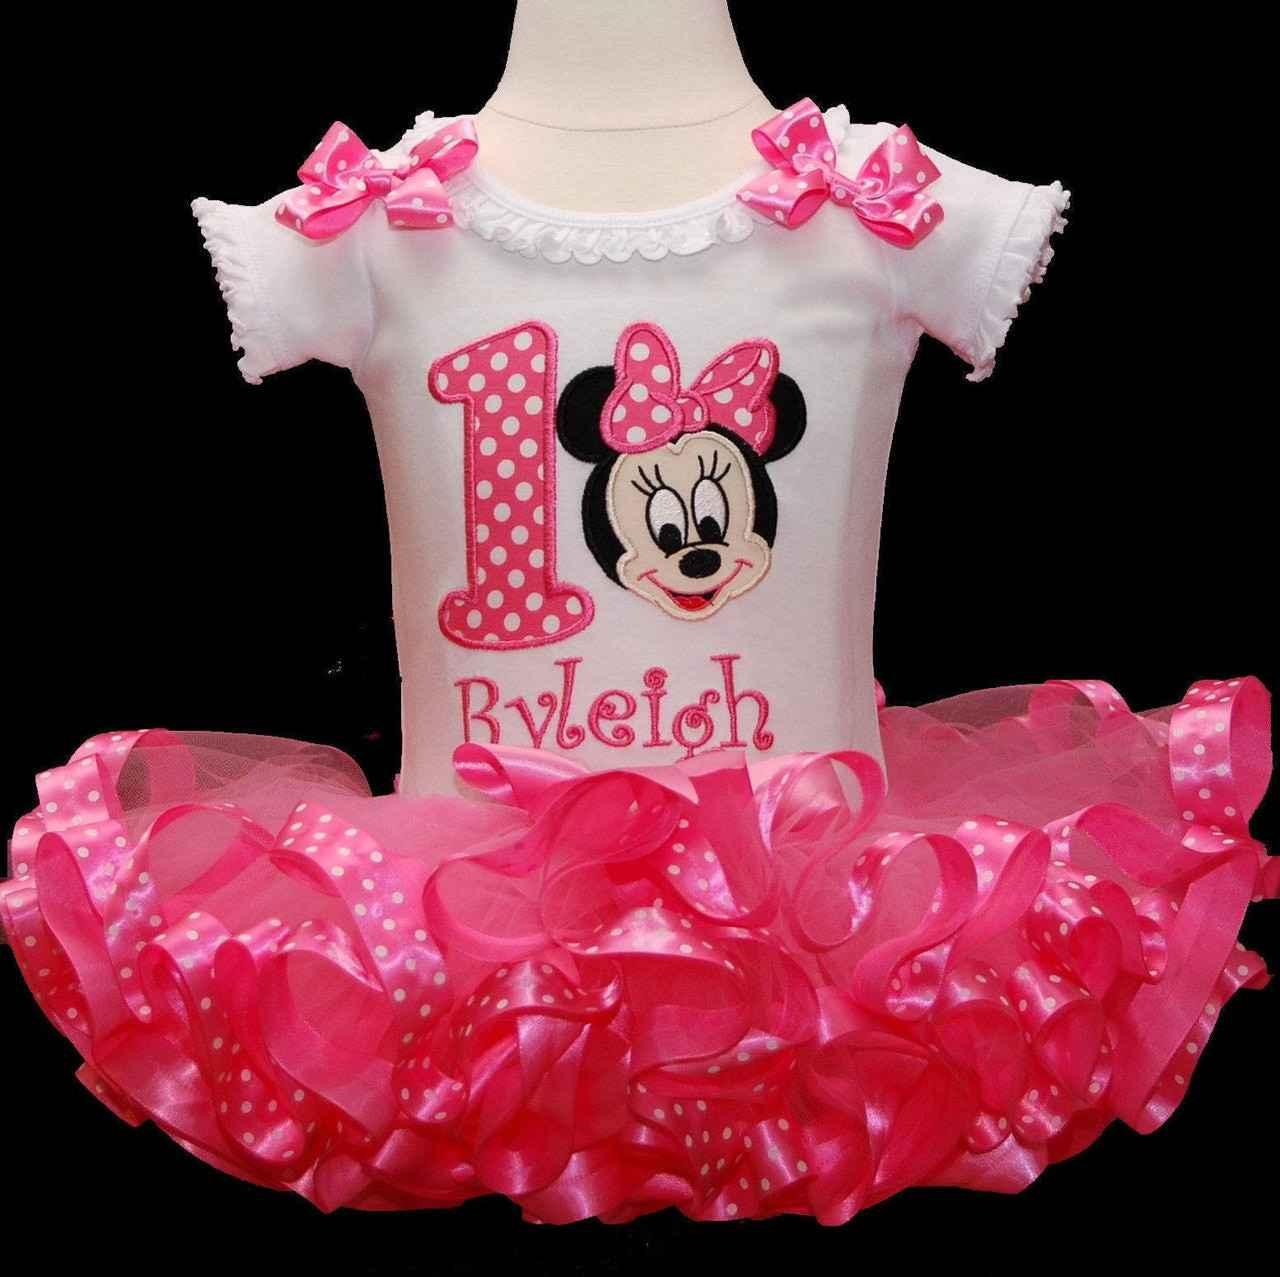 Minnie Mouse 1st Birthday Tutu Outfit, Baby Minnie Mouse tutu outfit, 1st birthday girl, cake smash outfit, birthday tutu dress ribbon trim